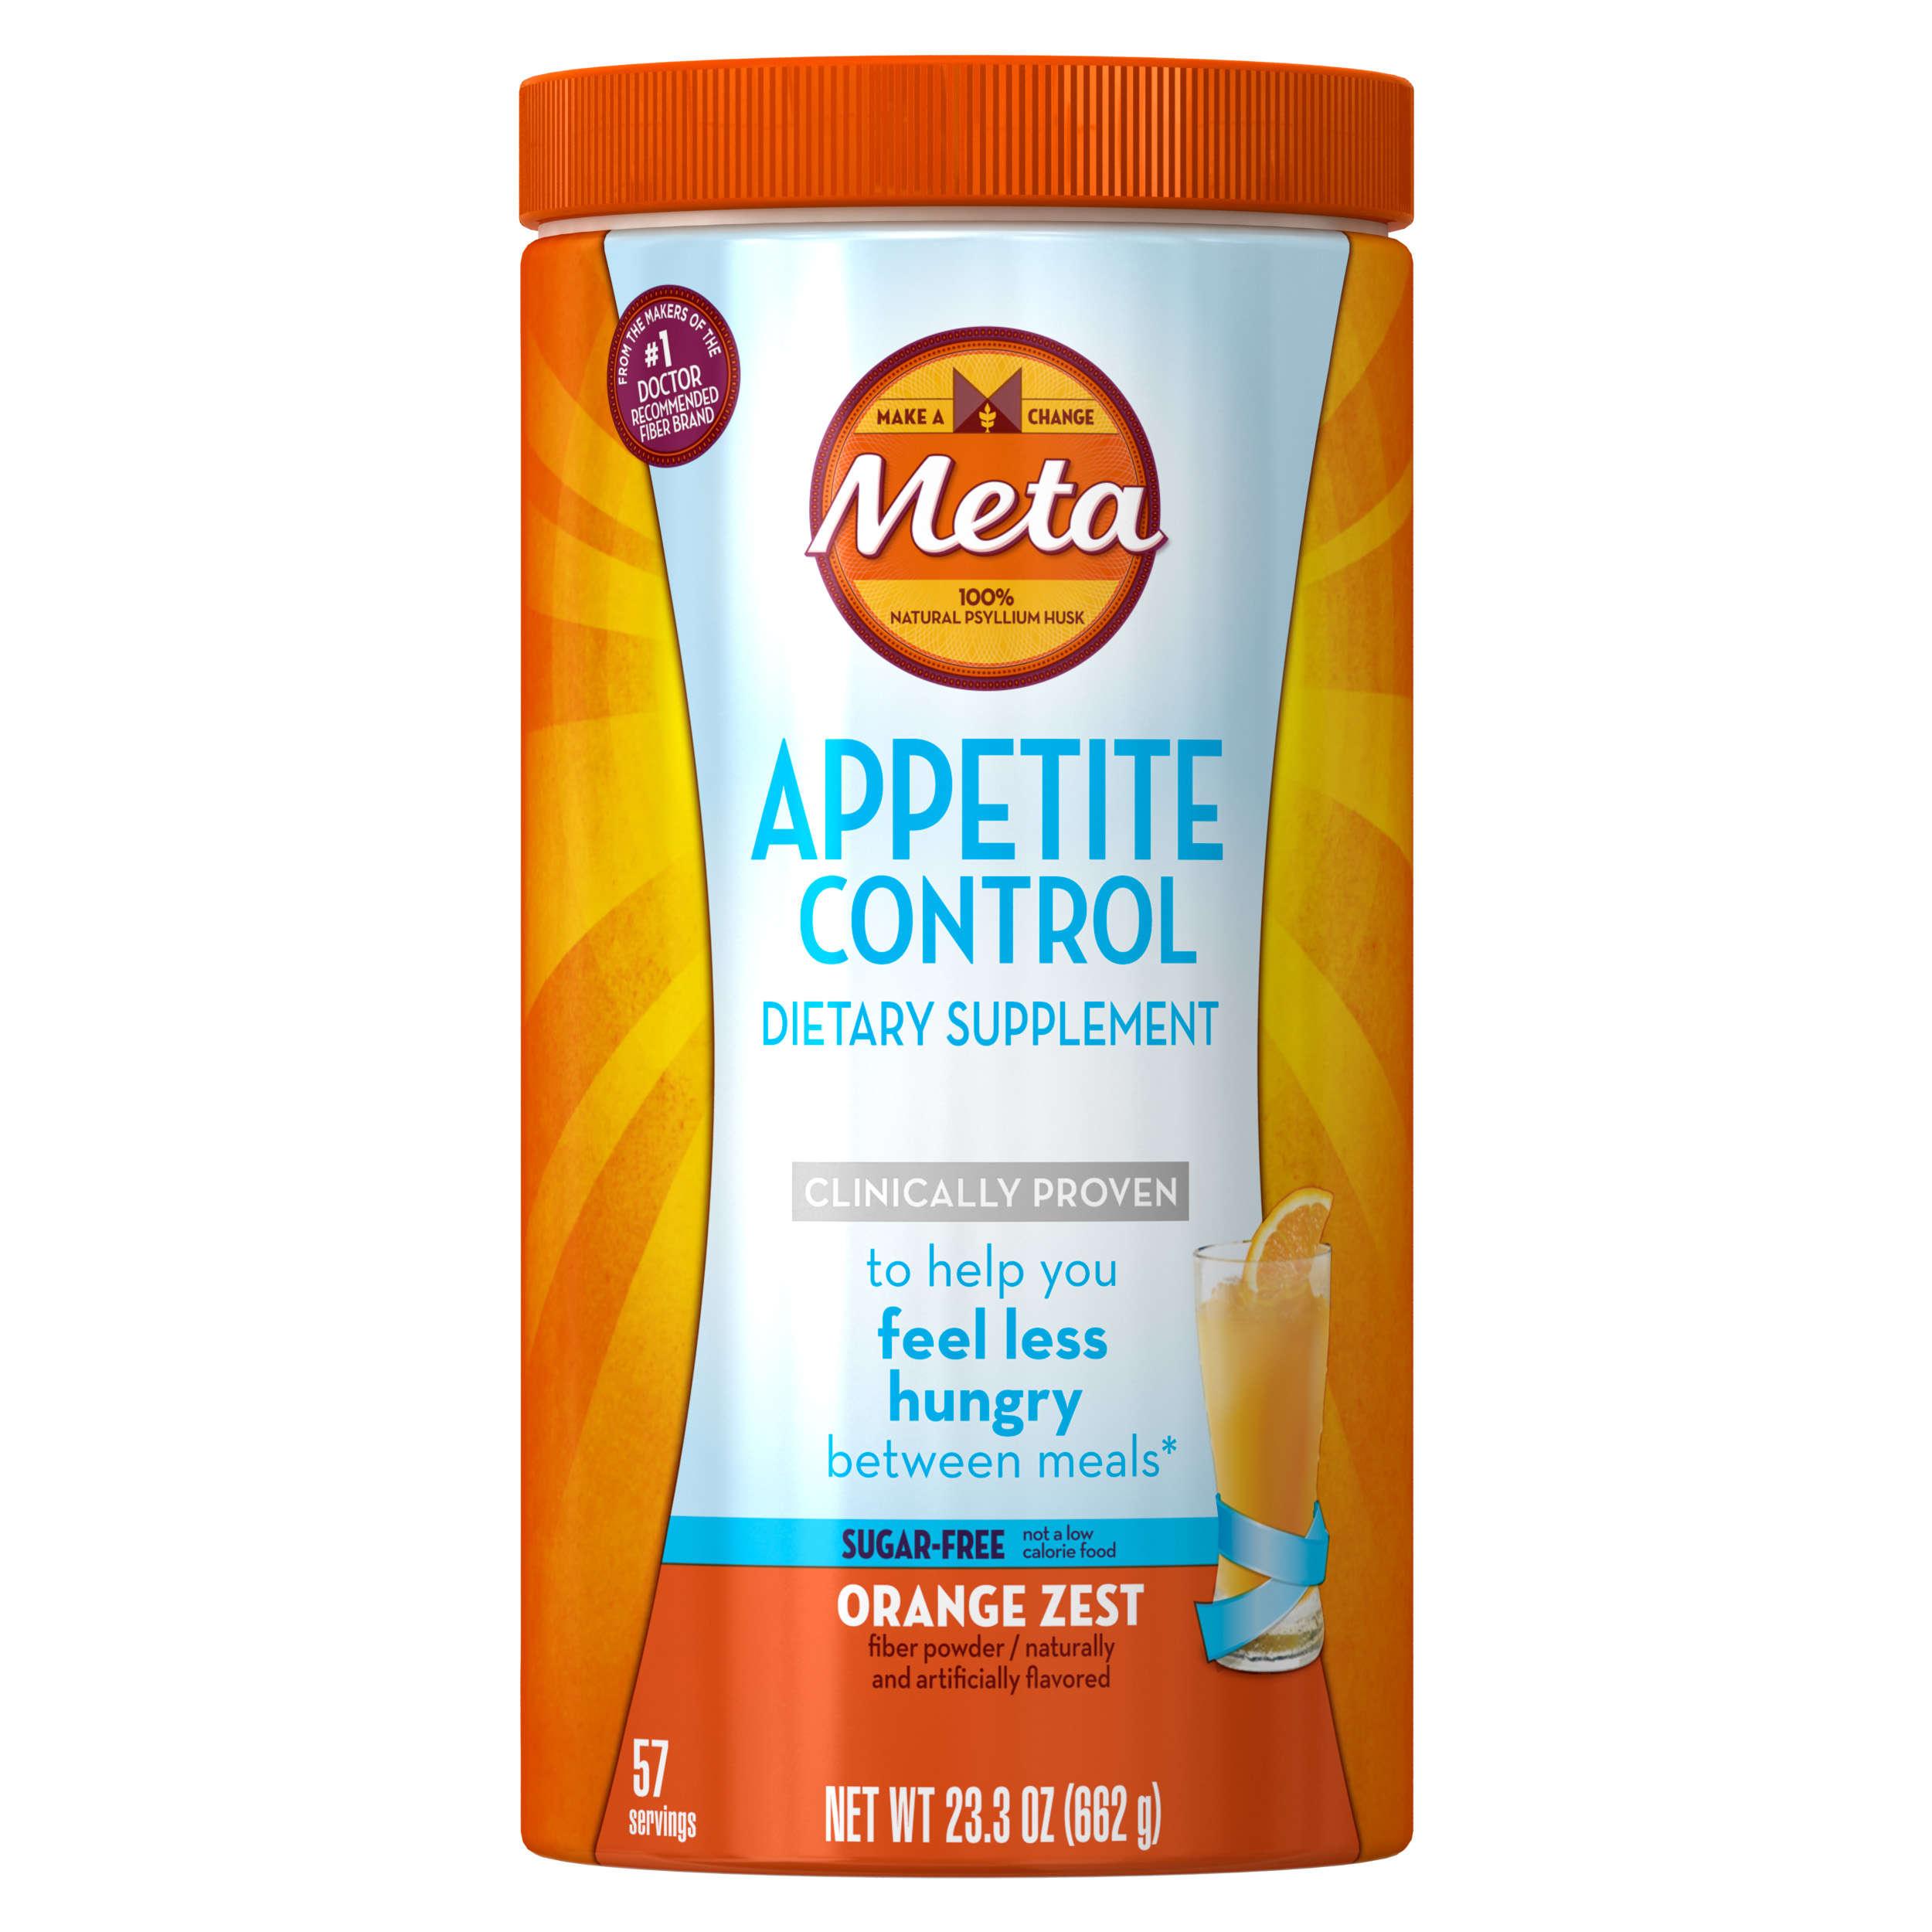 Metamucil Daily Appetite Control Weight Loss Supplements, Orange Zest Sugar Free Fiber Appetite Suppressant, 57 Doses